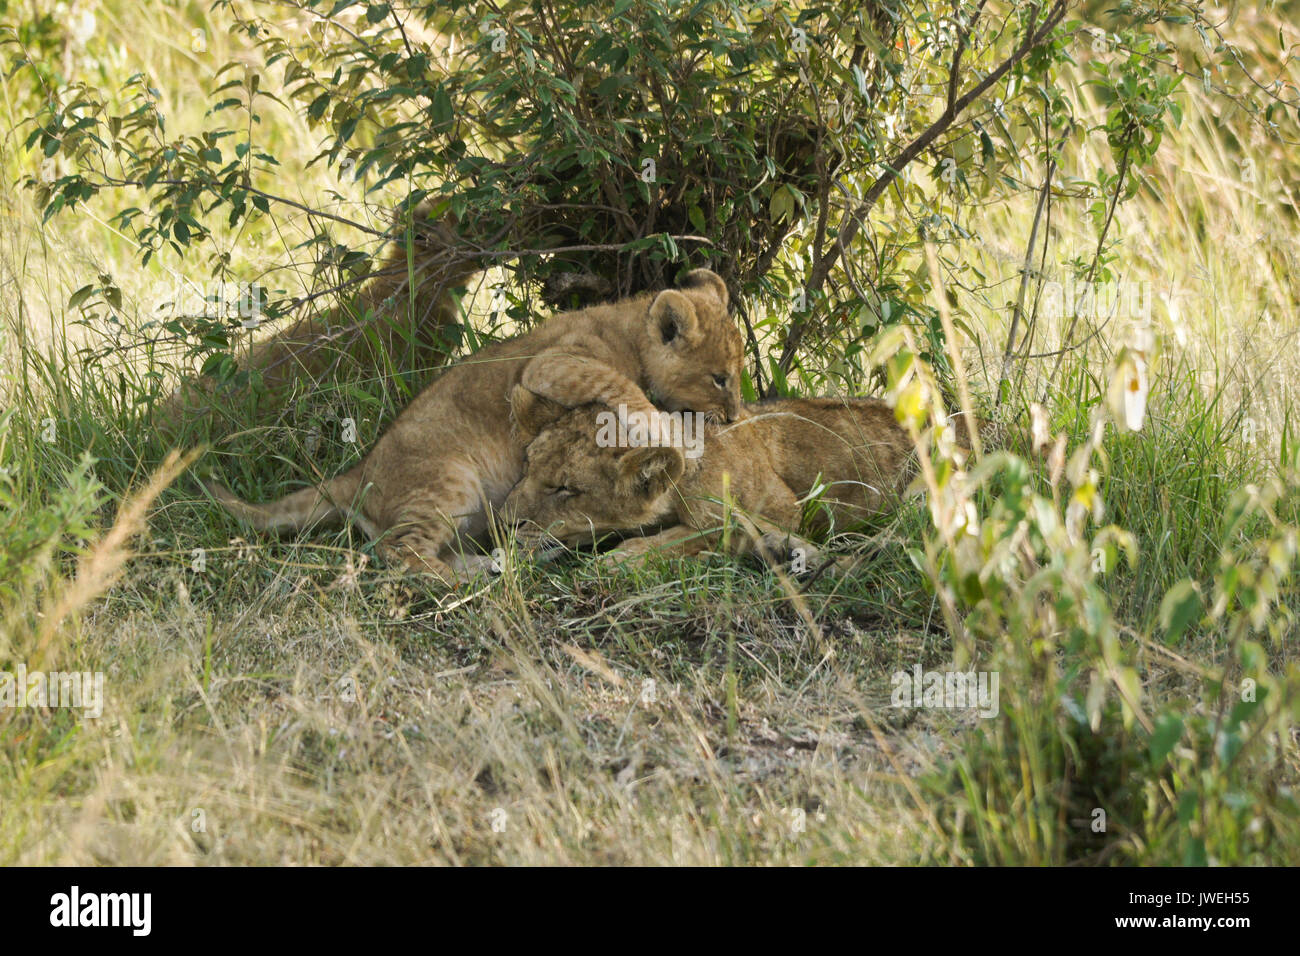 Tiny lion cub playing with sleeping older cub, Masai Mara Game Reserve, Kenya - Stock Image